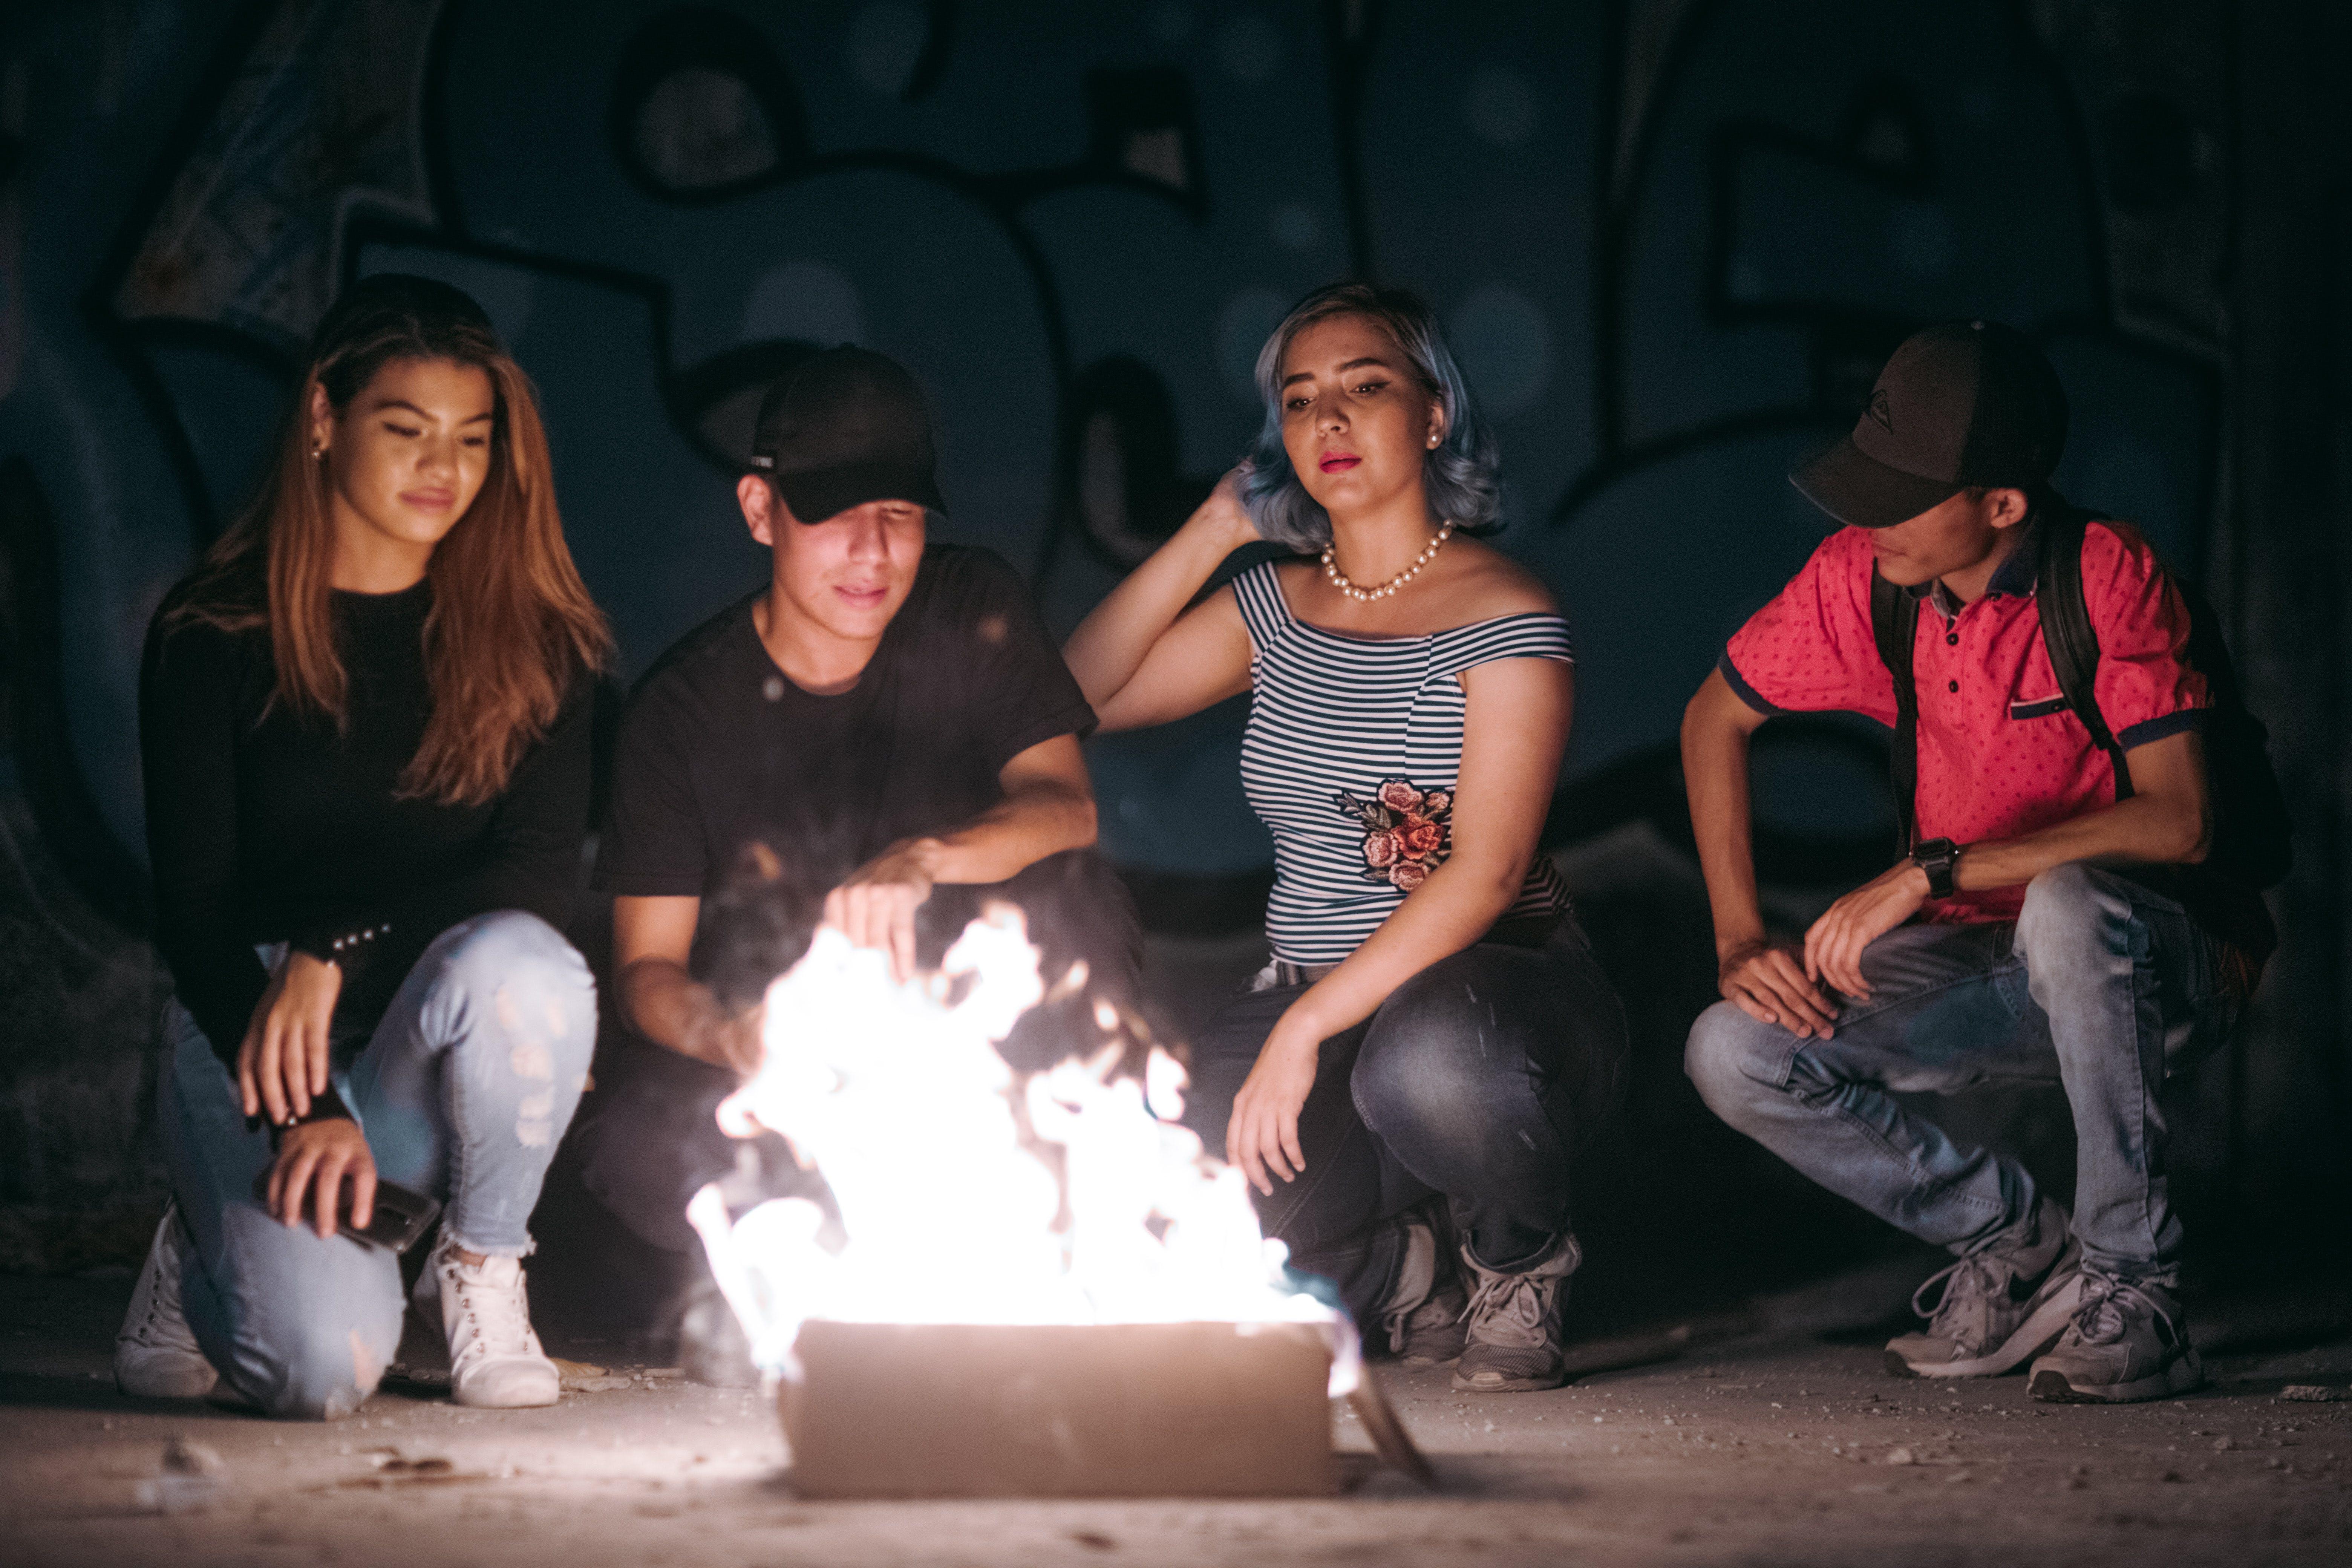 Two Men And Women Sitting Near Burning Box